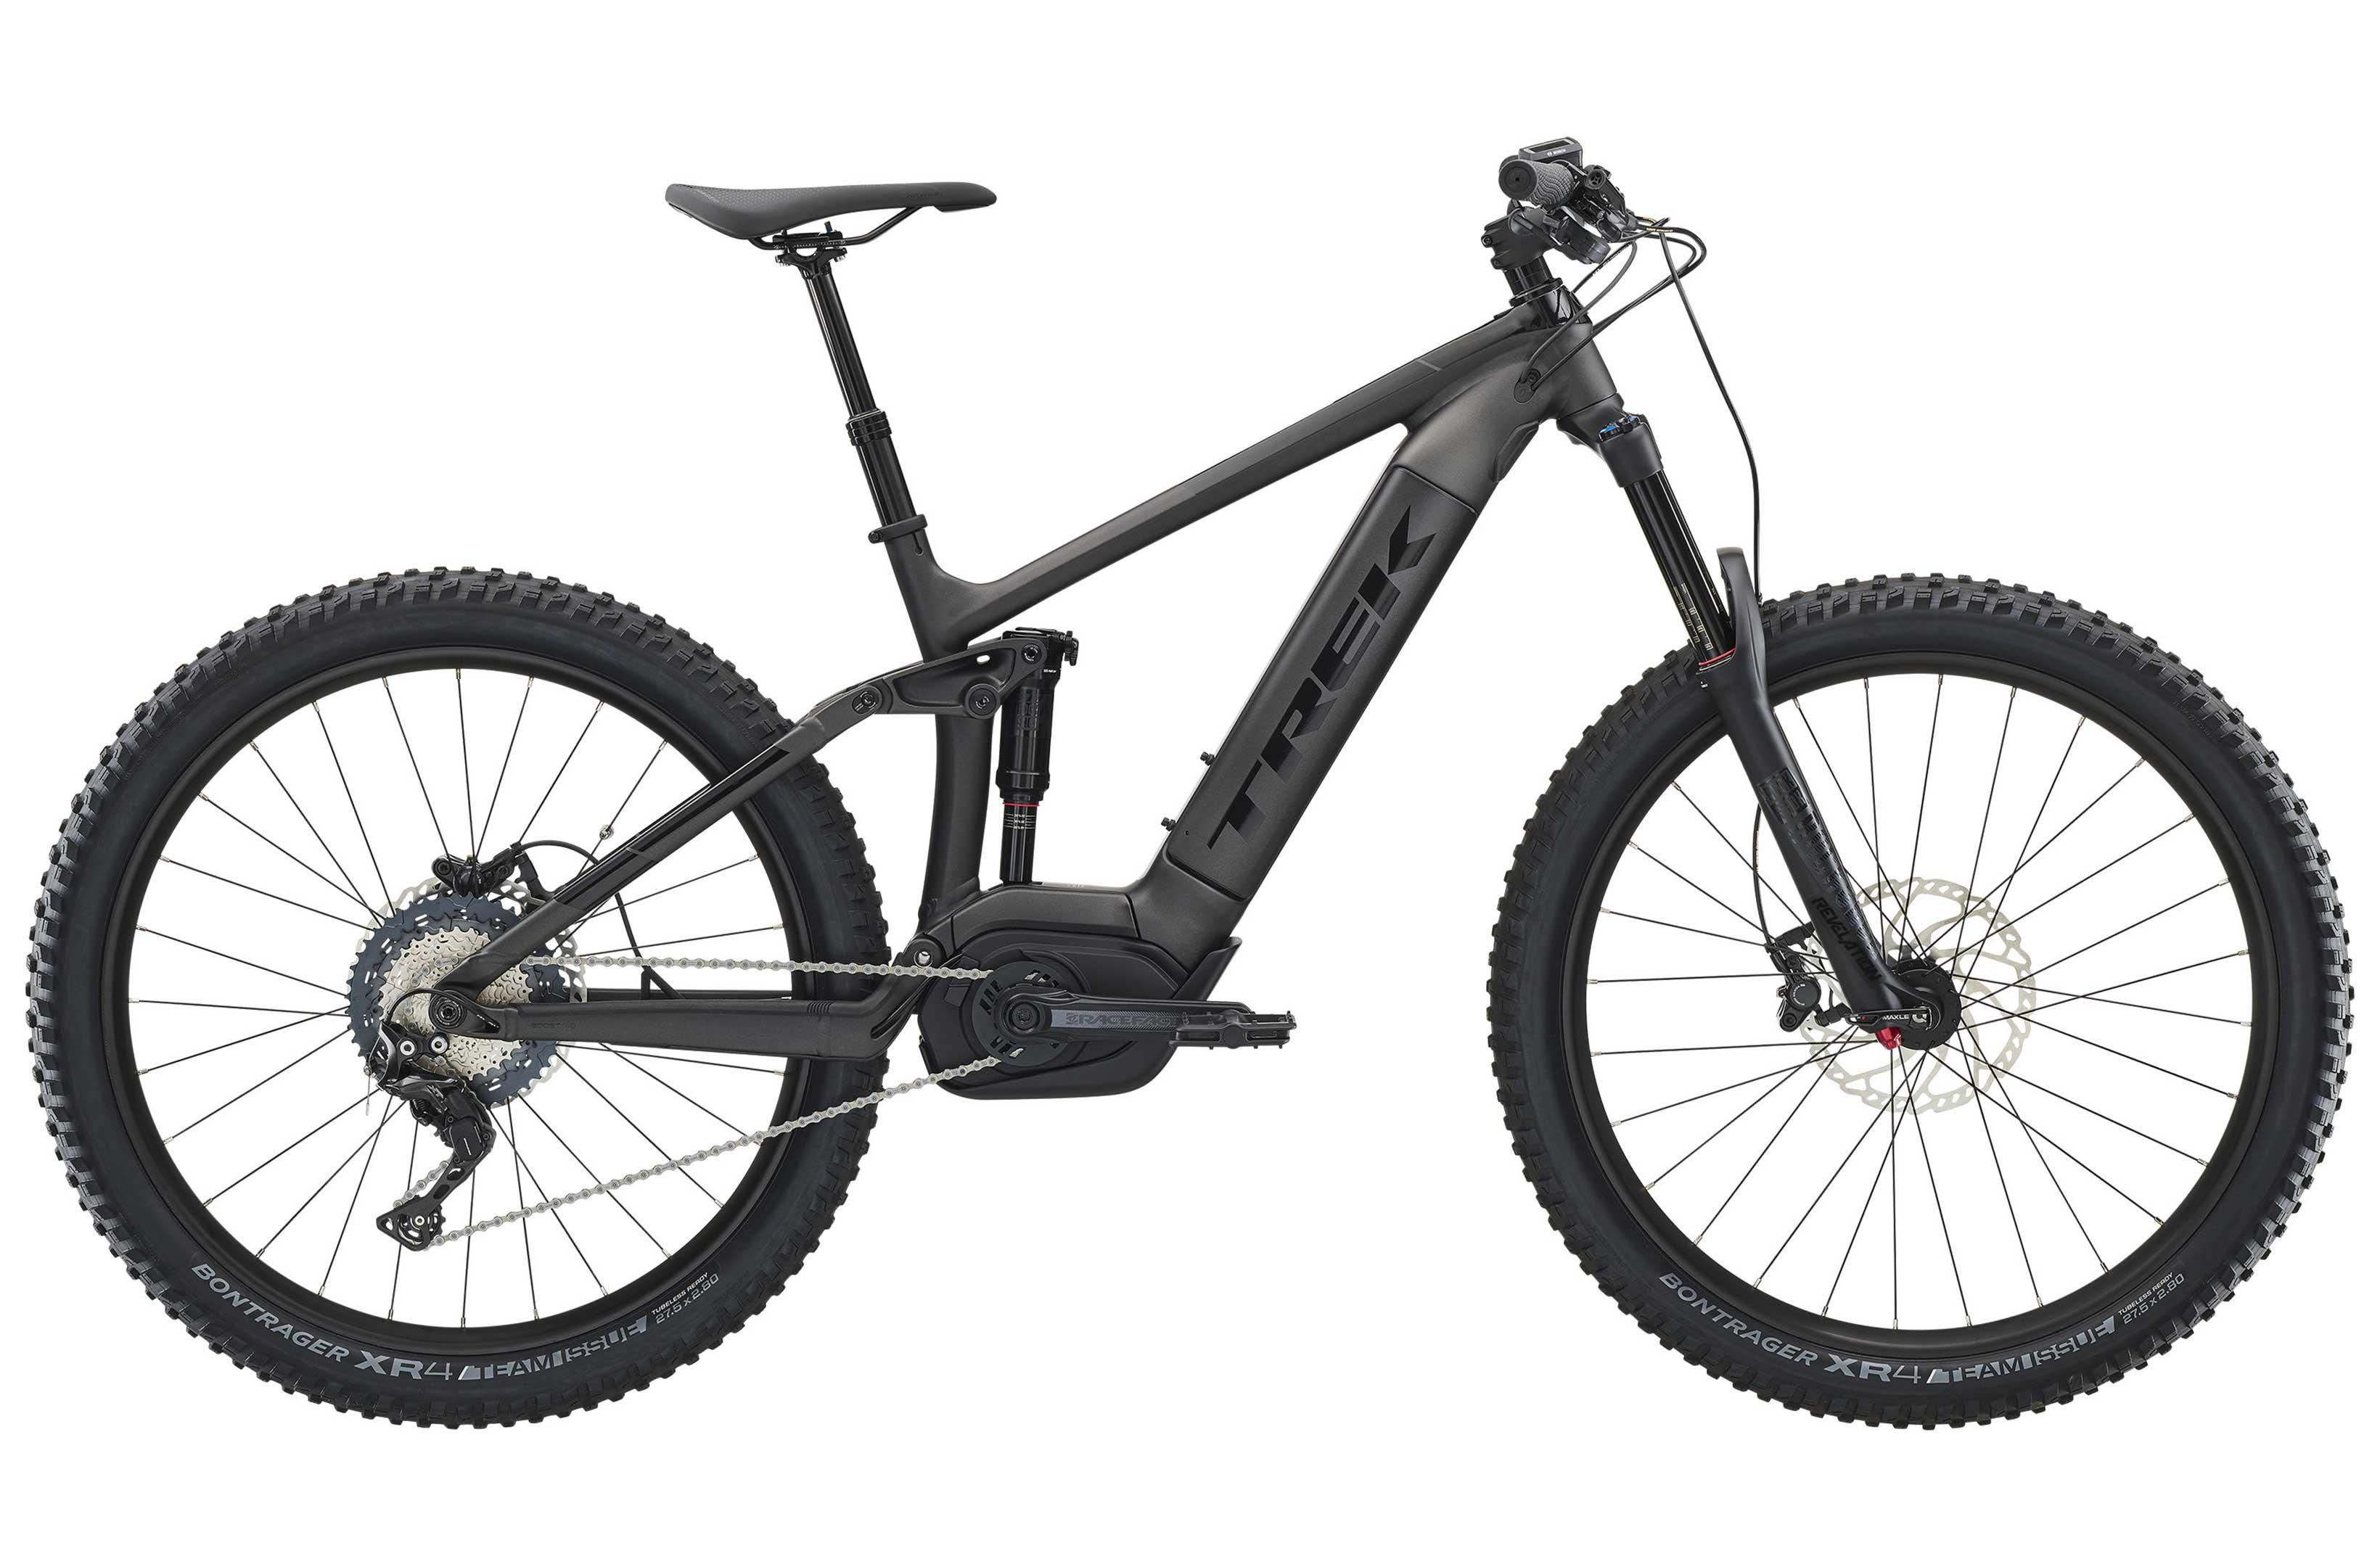 Trek Powerfly FS 7 2019 Electric Mountain Bike (Black, 17.5 Inch)